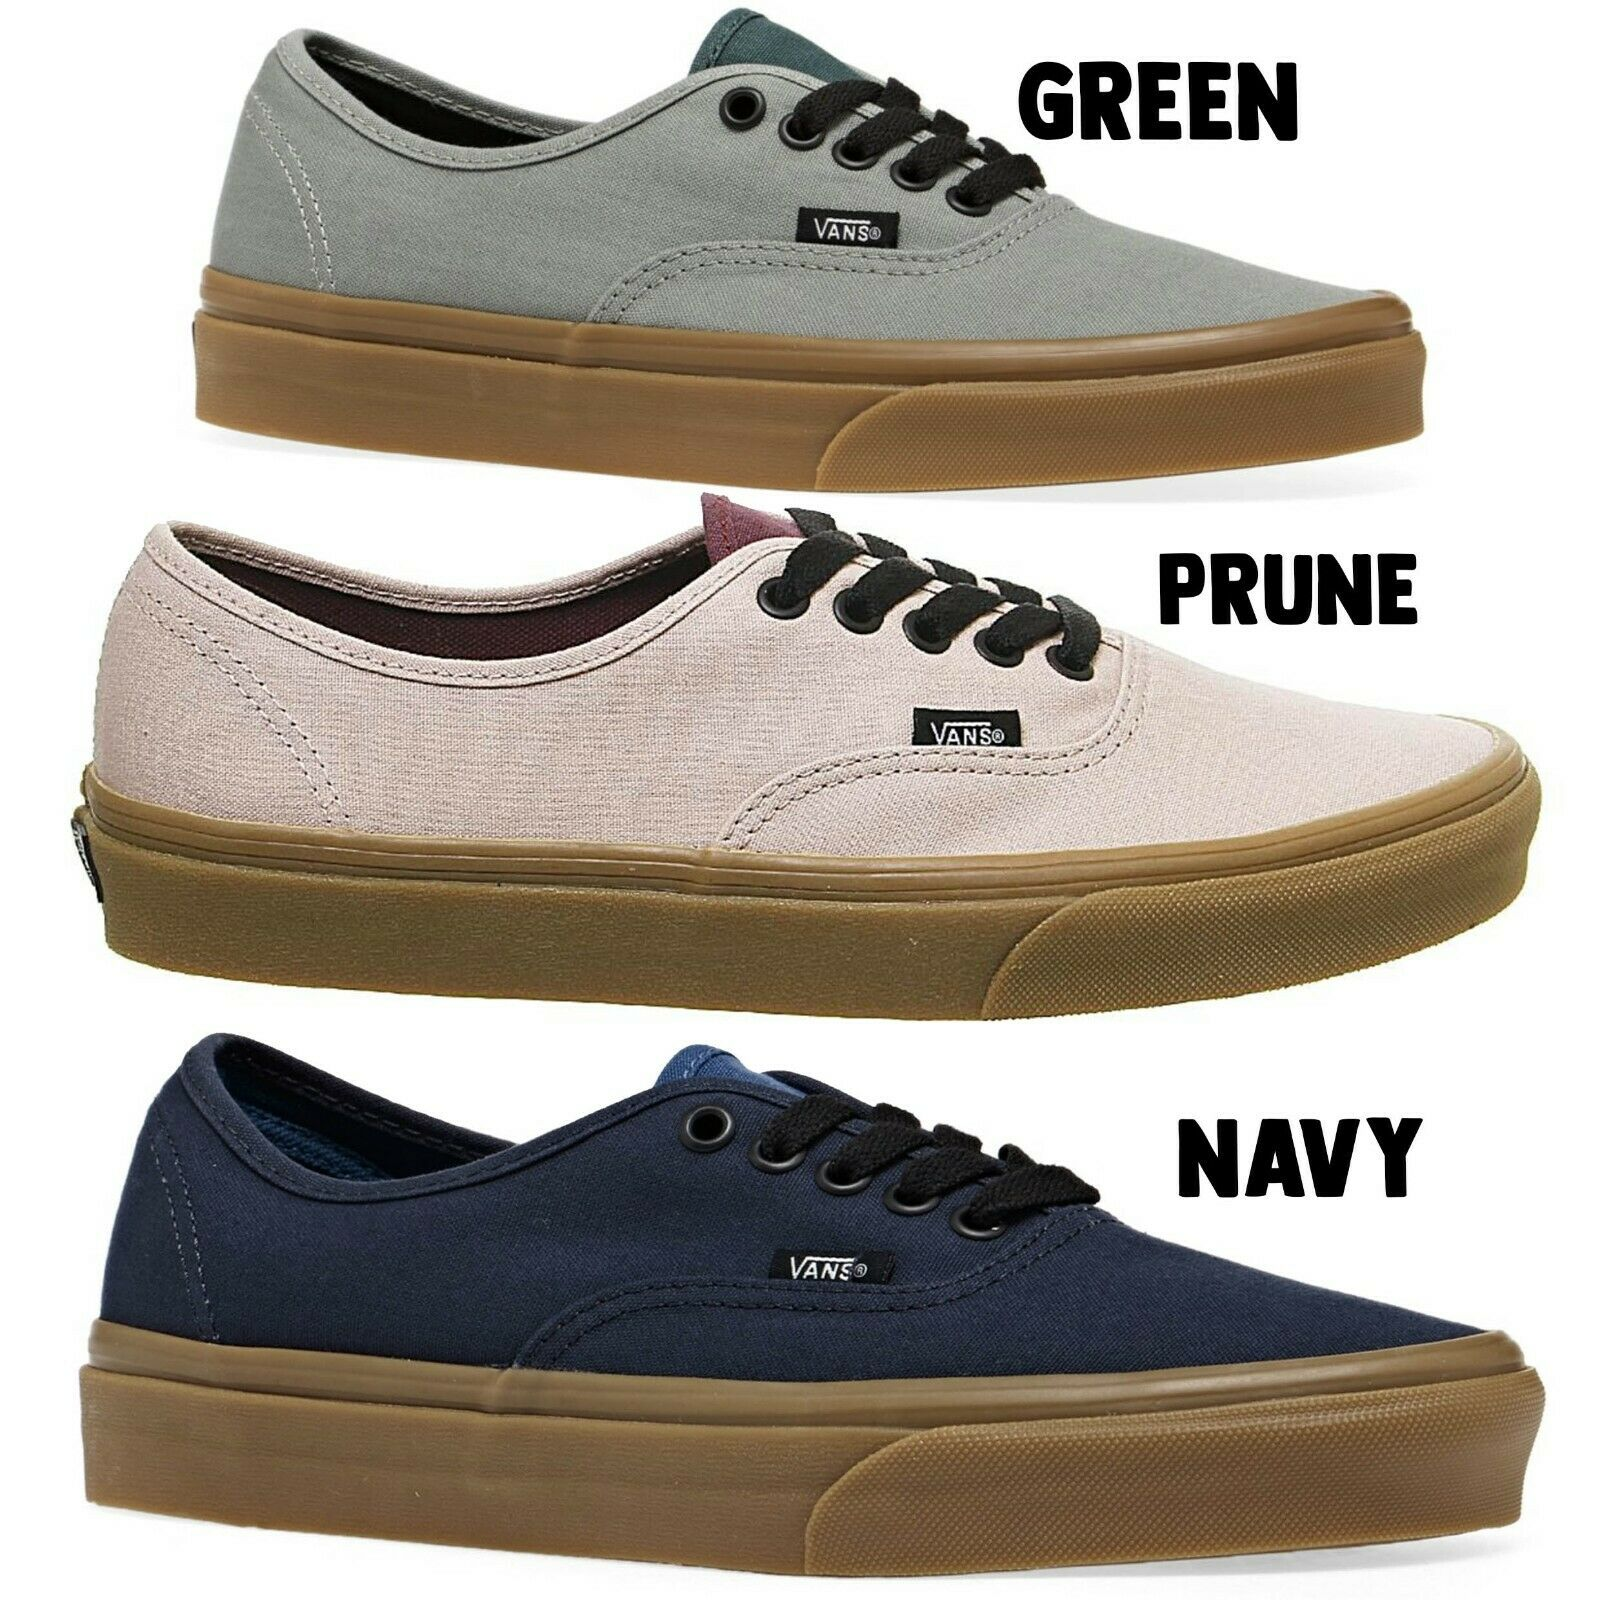 Vans - Authentic - Gum Sole - Green